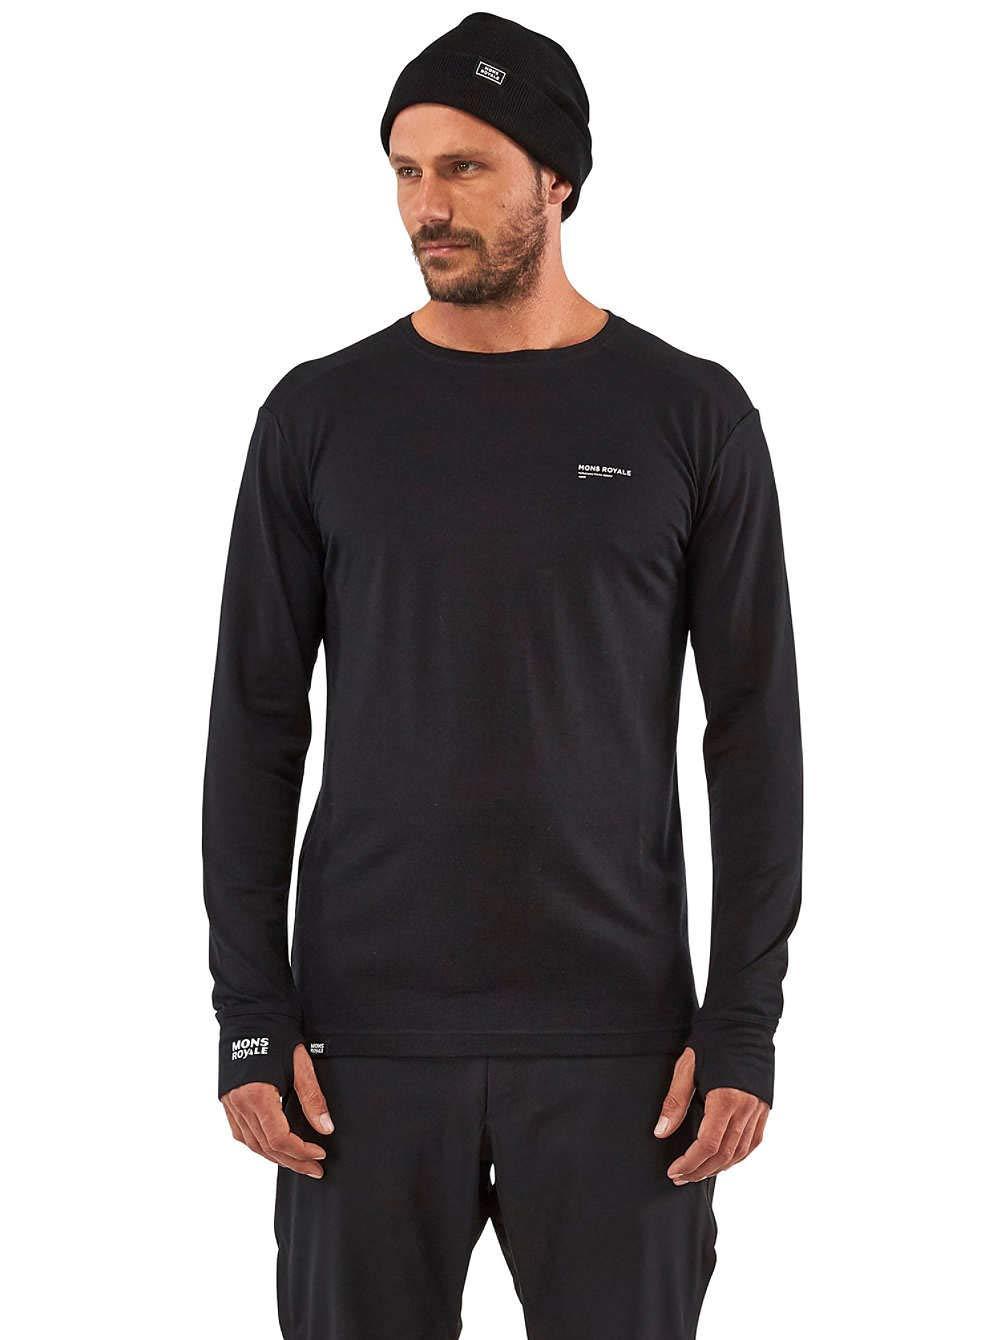 Mons Royale Alta Tech LS Crew Camiseta para Hombre